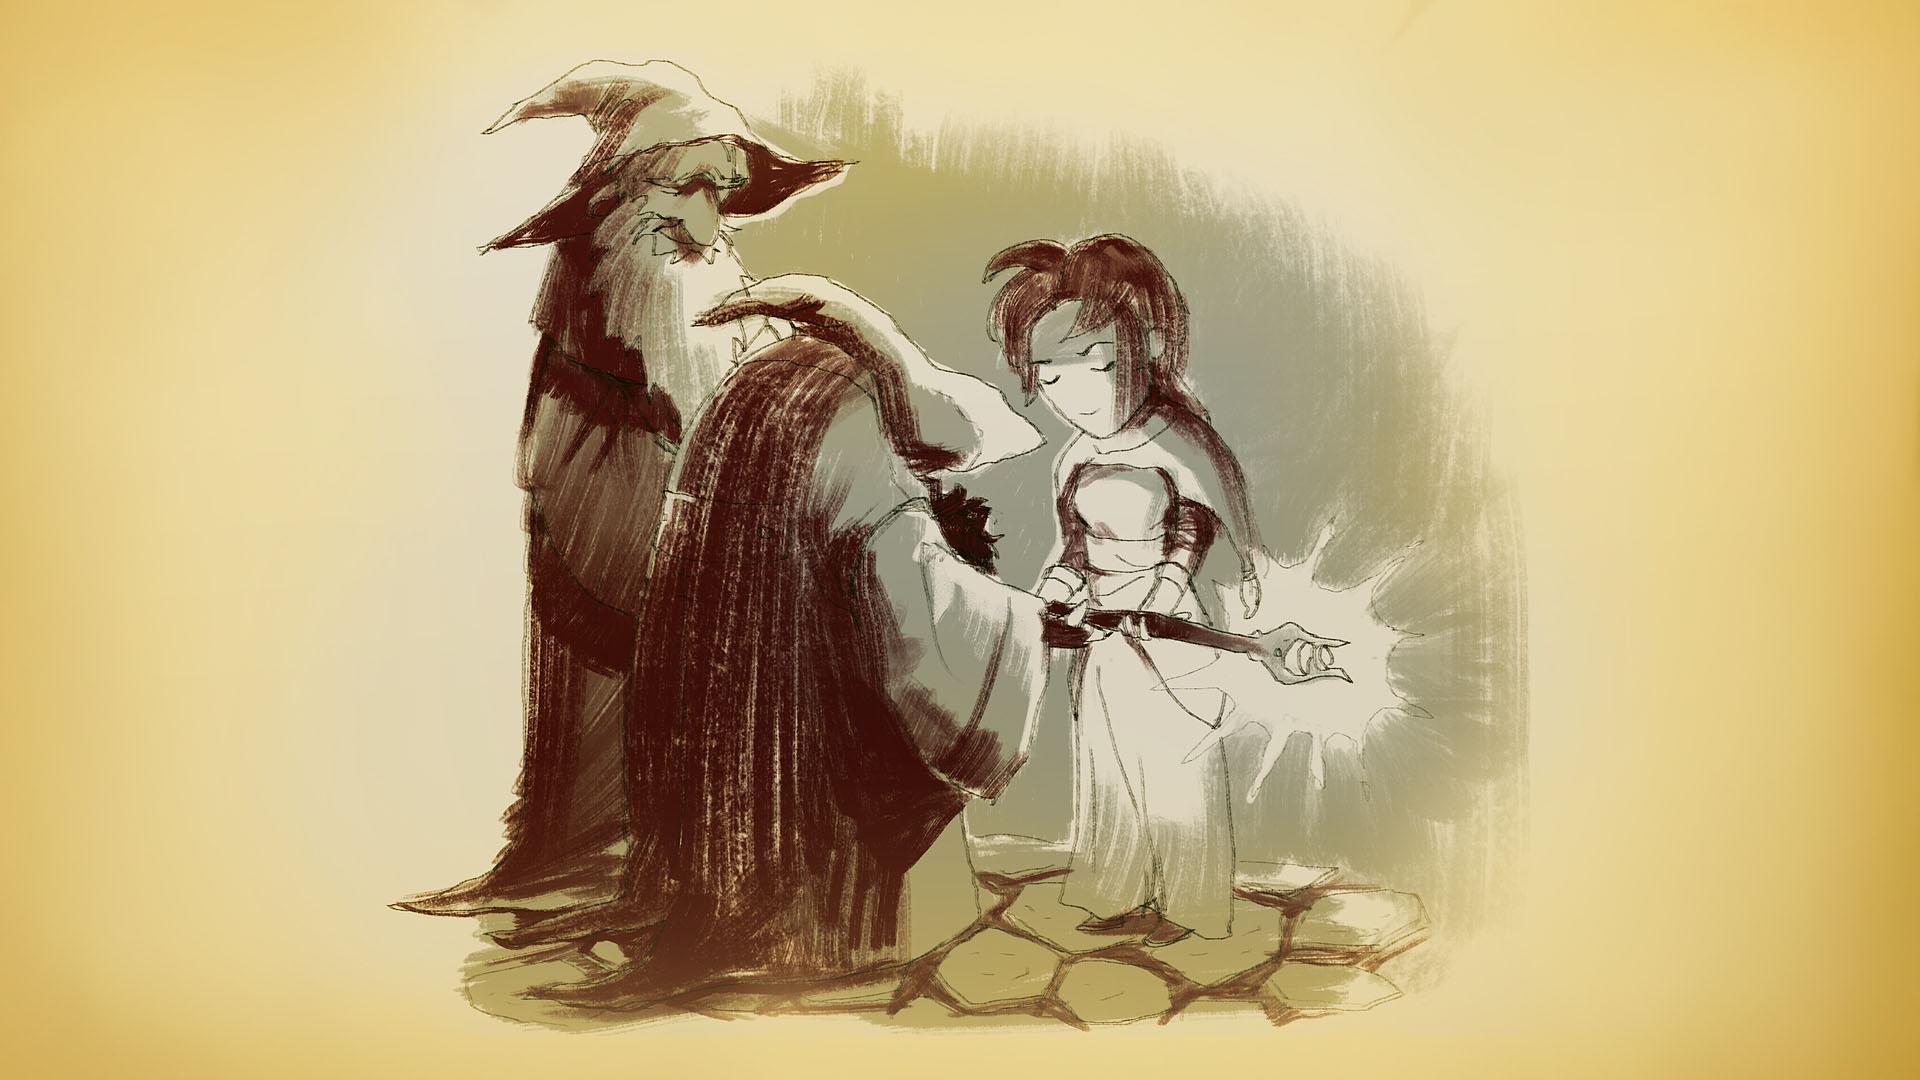 image braveland wizard artwork 1 jpg steam trading cards wiki